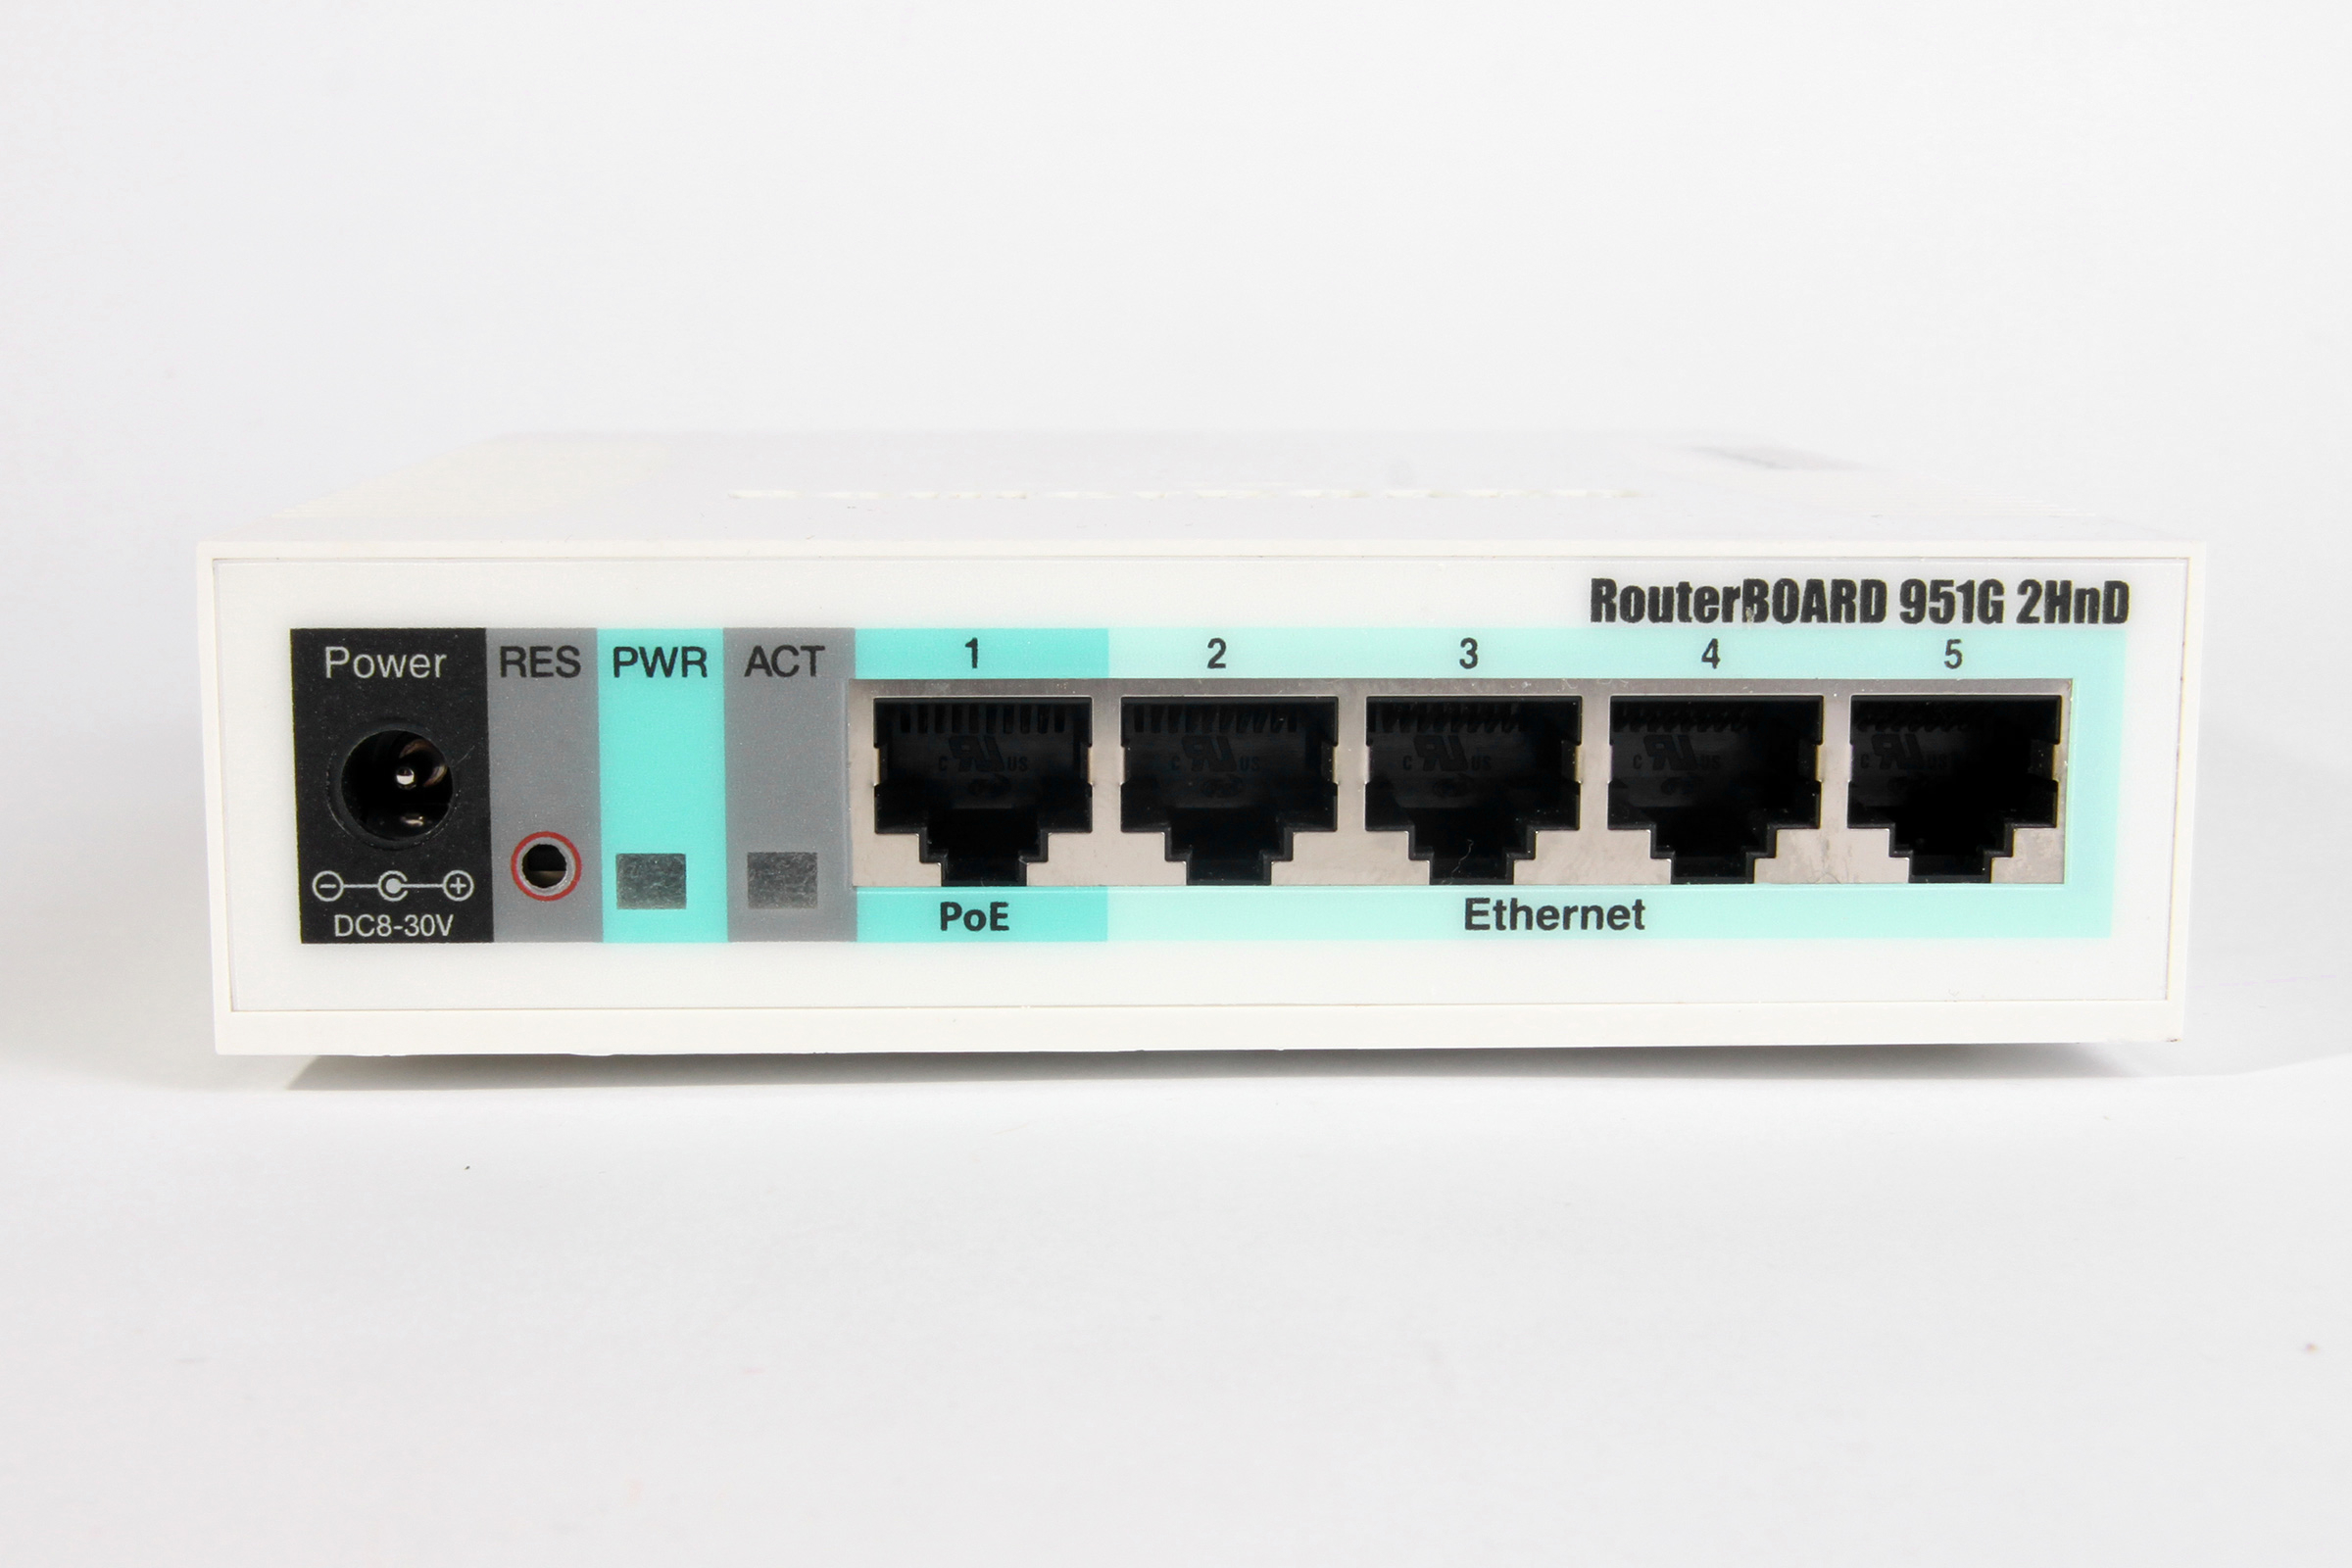 Порты rb951G-2HnD